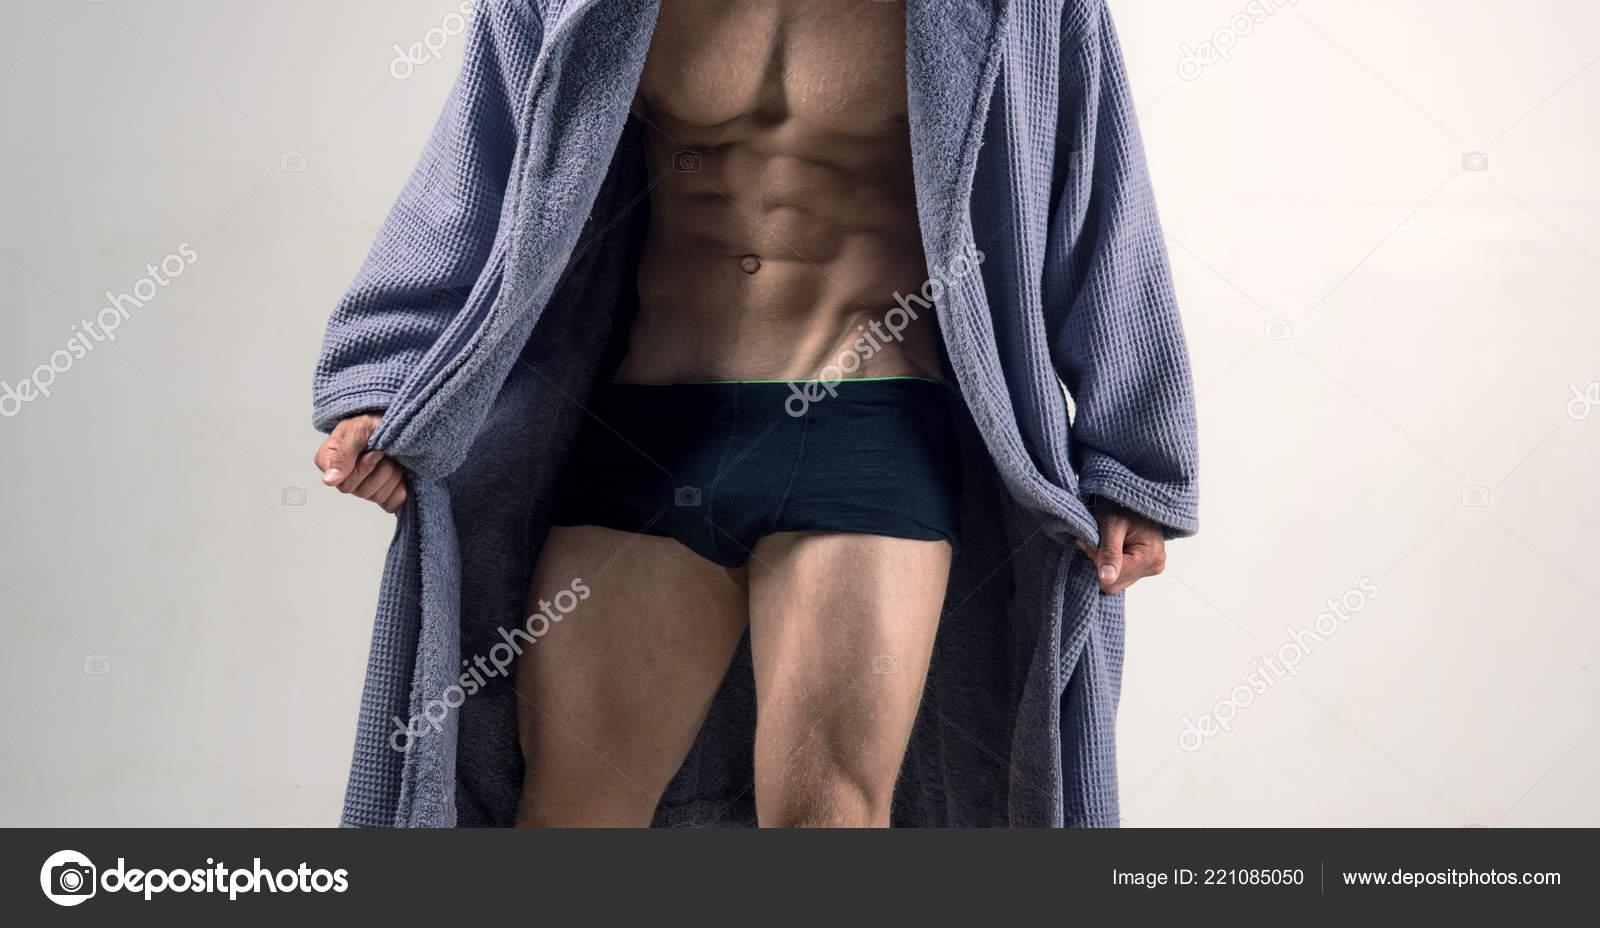 b4670e155356 Modelo masculino topless con el hermoso torso. Gay en ropa interior ...